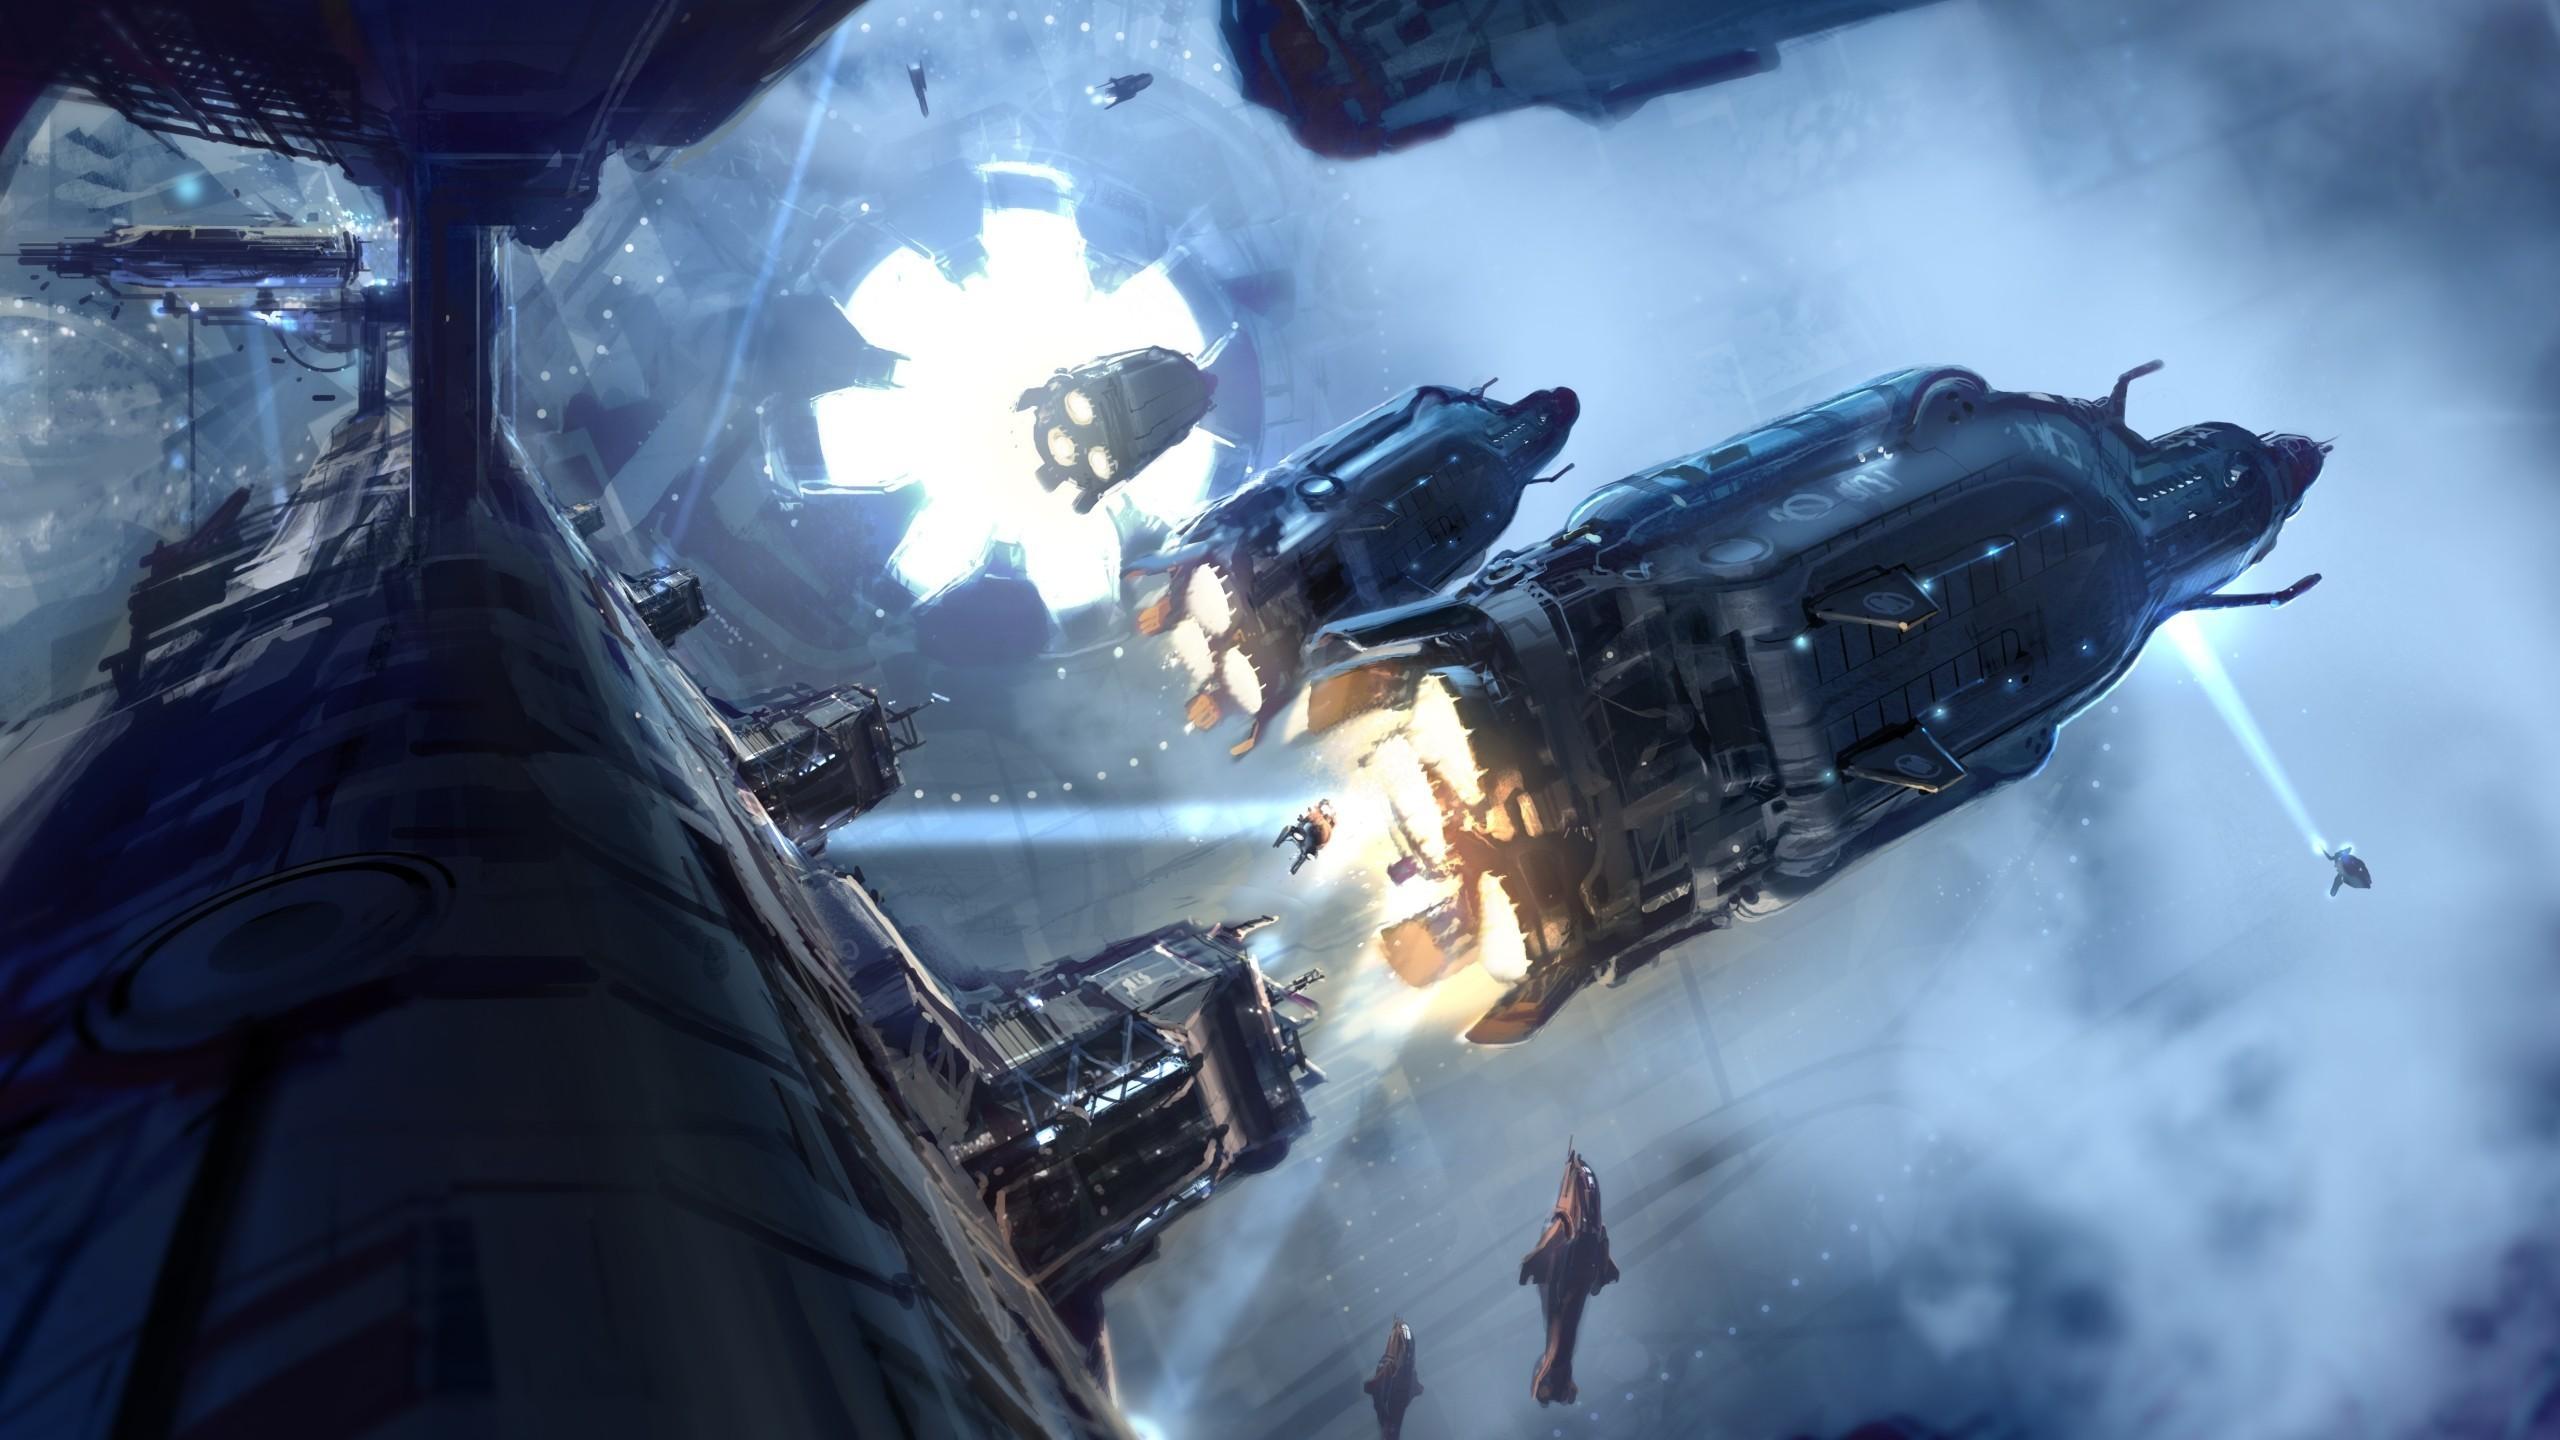 Halo 4 Concept Art Sci Fi Warriors Futuristic Vehicles